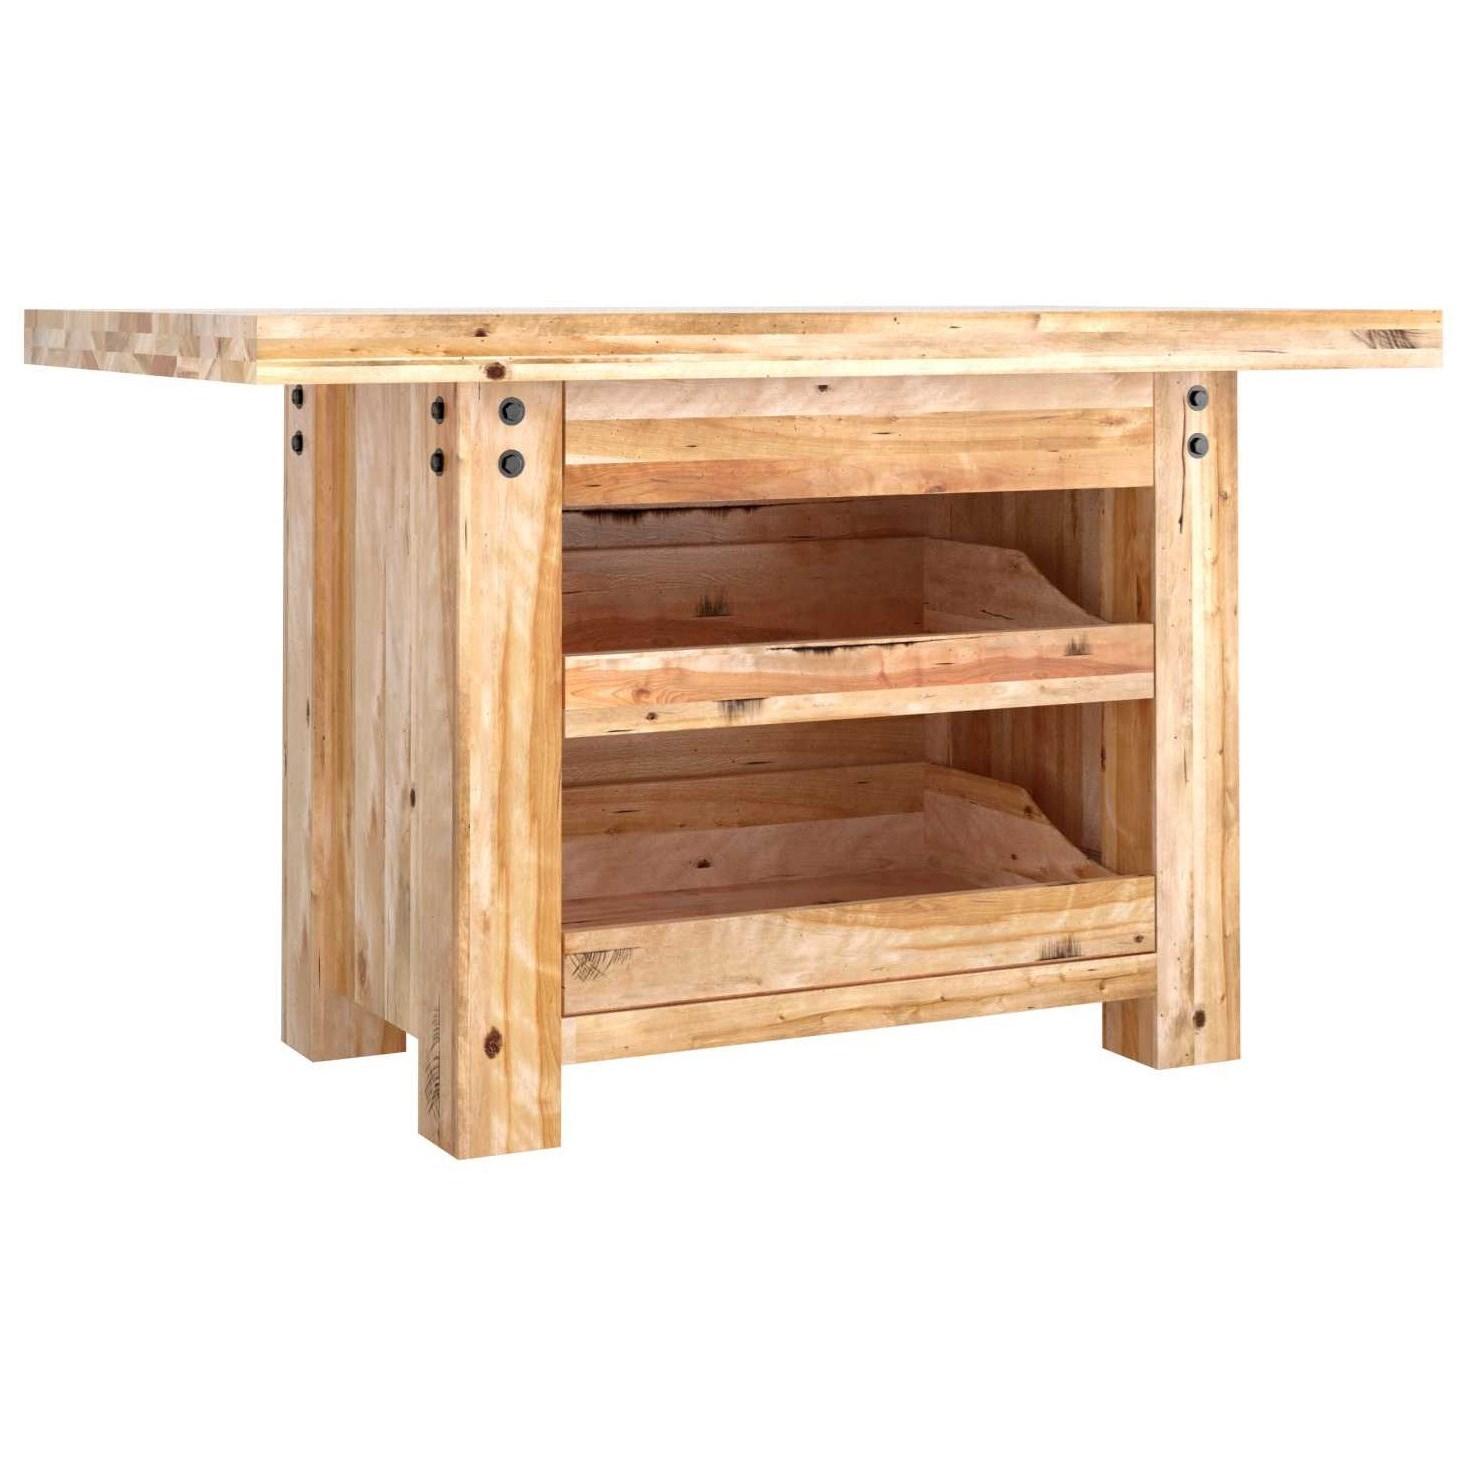 Customizable Island Table